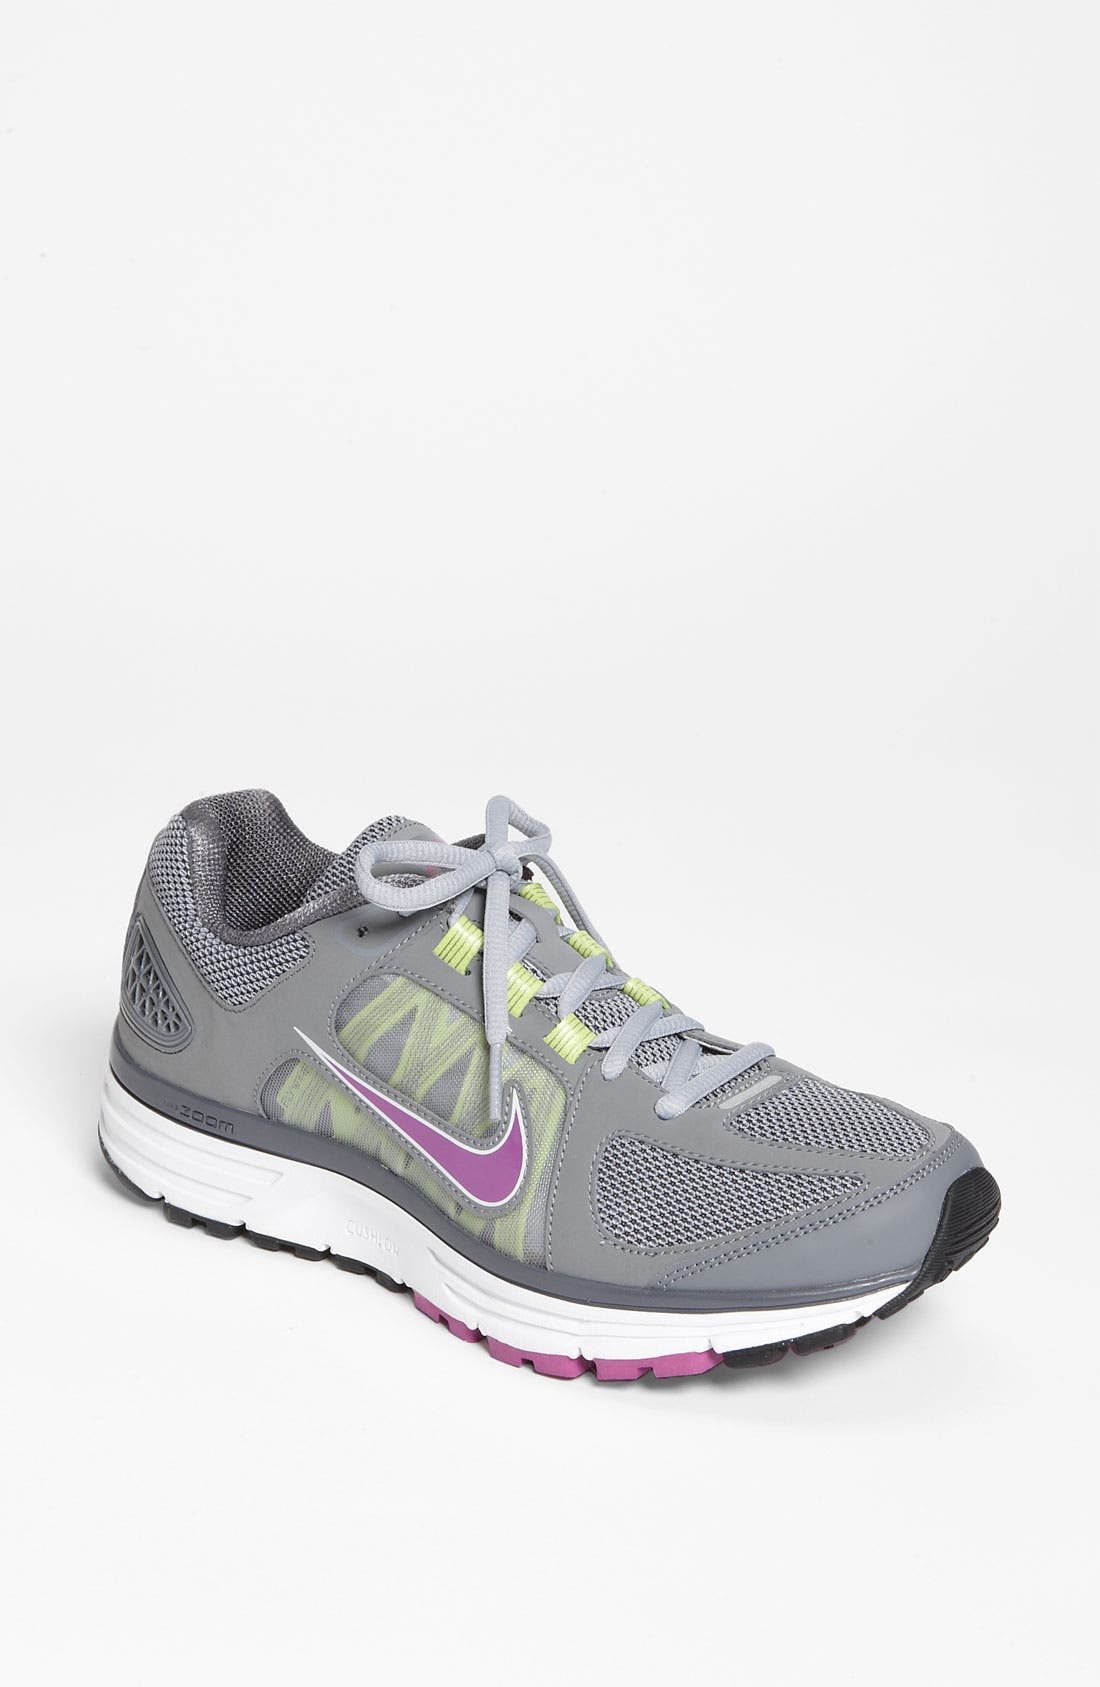 Alternate Image 1 Selected - Nike 'Zoom Vomero+ 7' Running Shoe (Women)